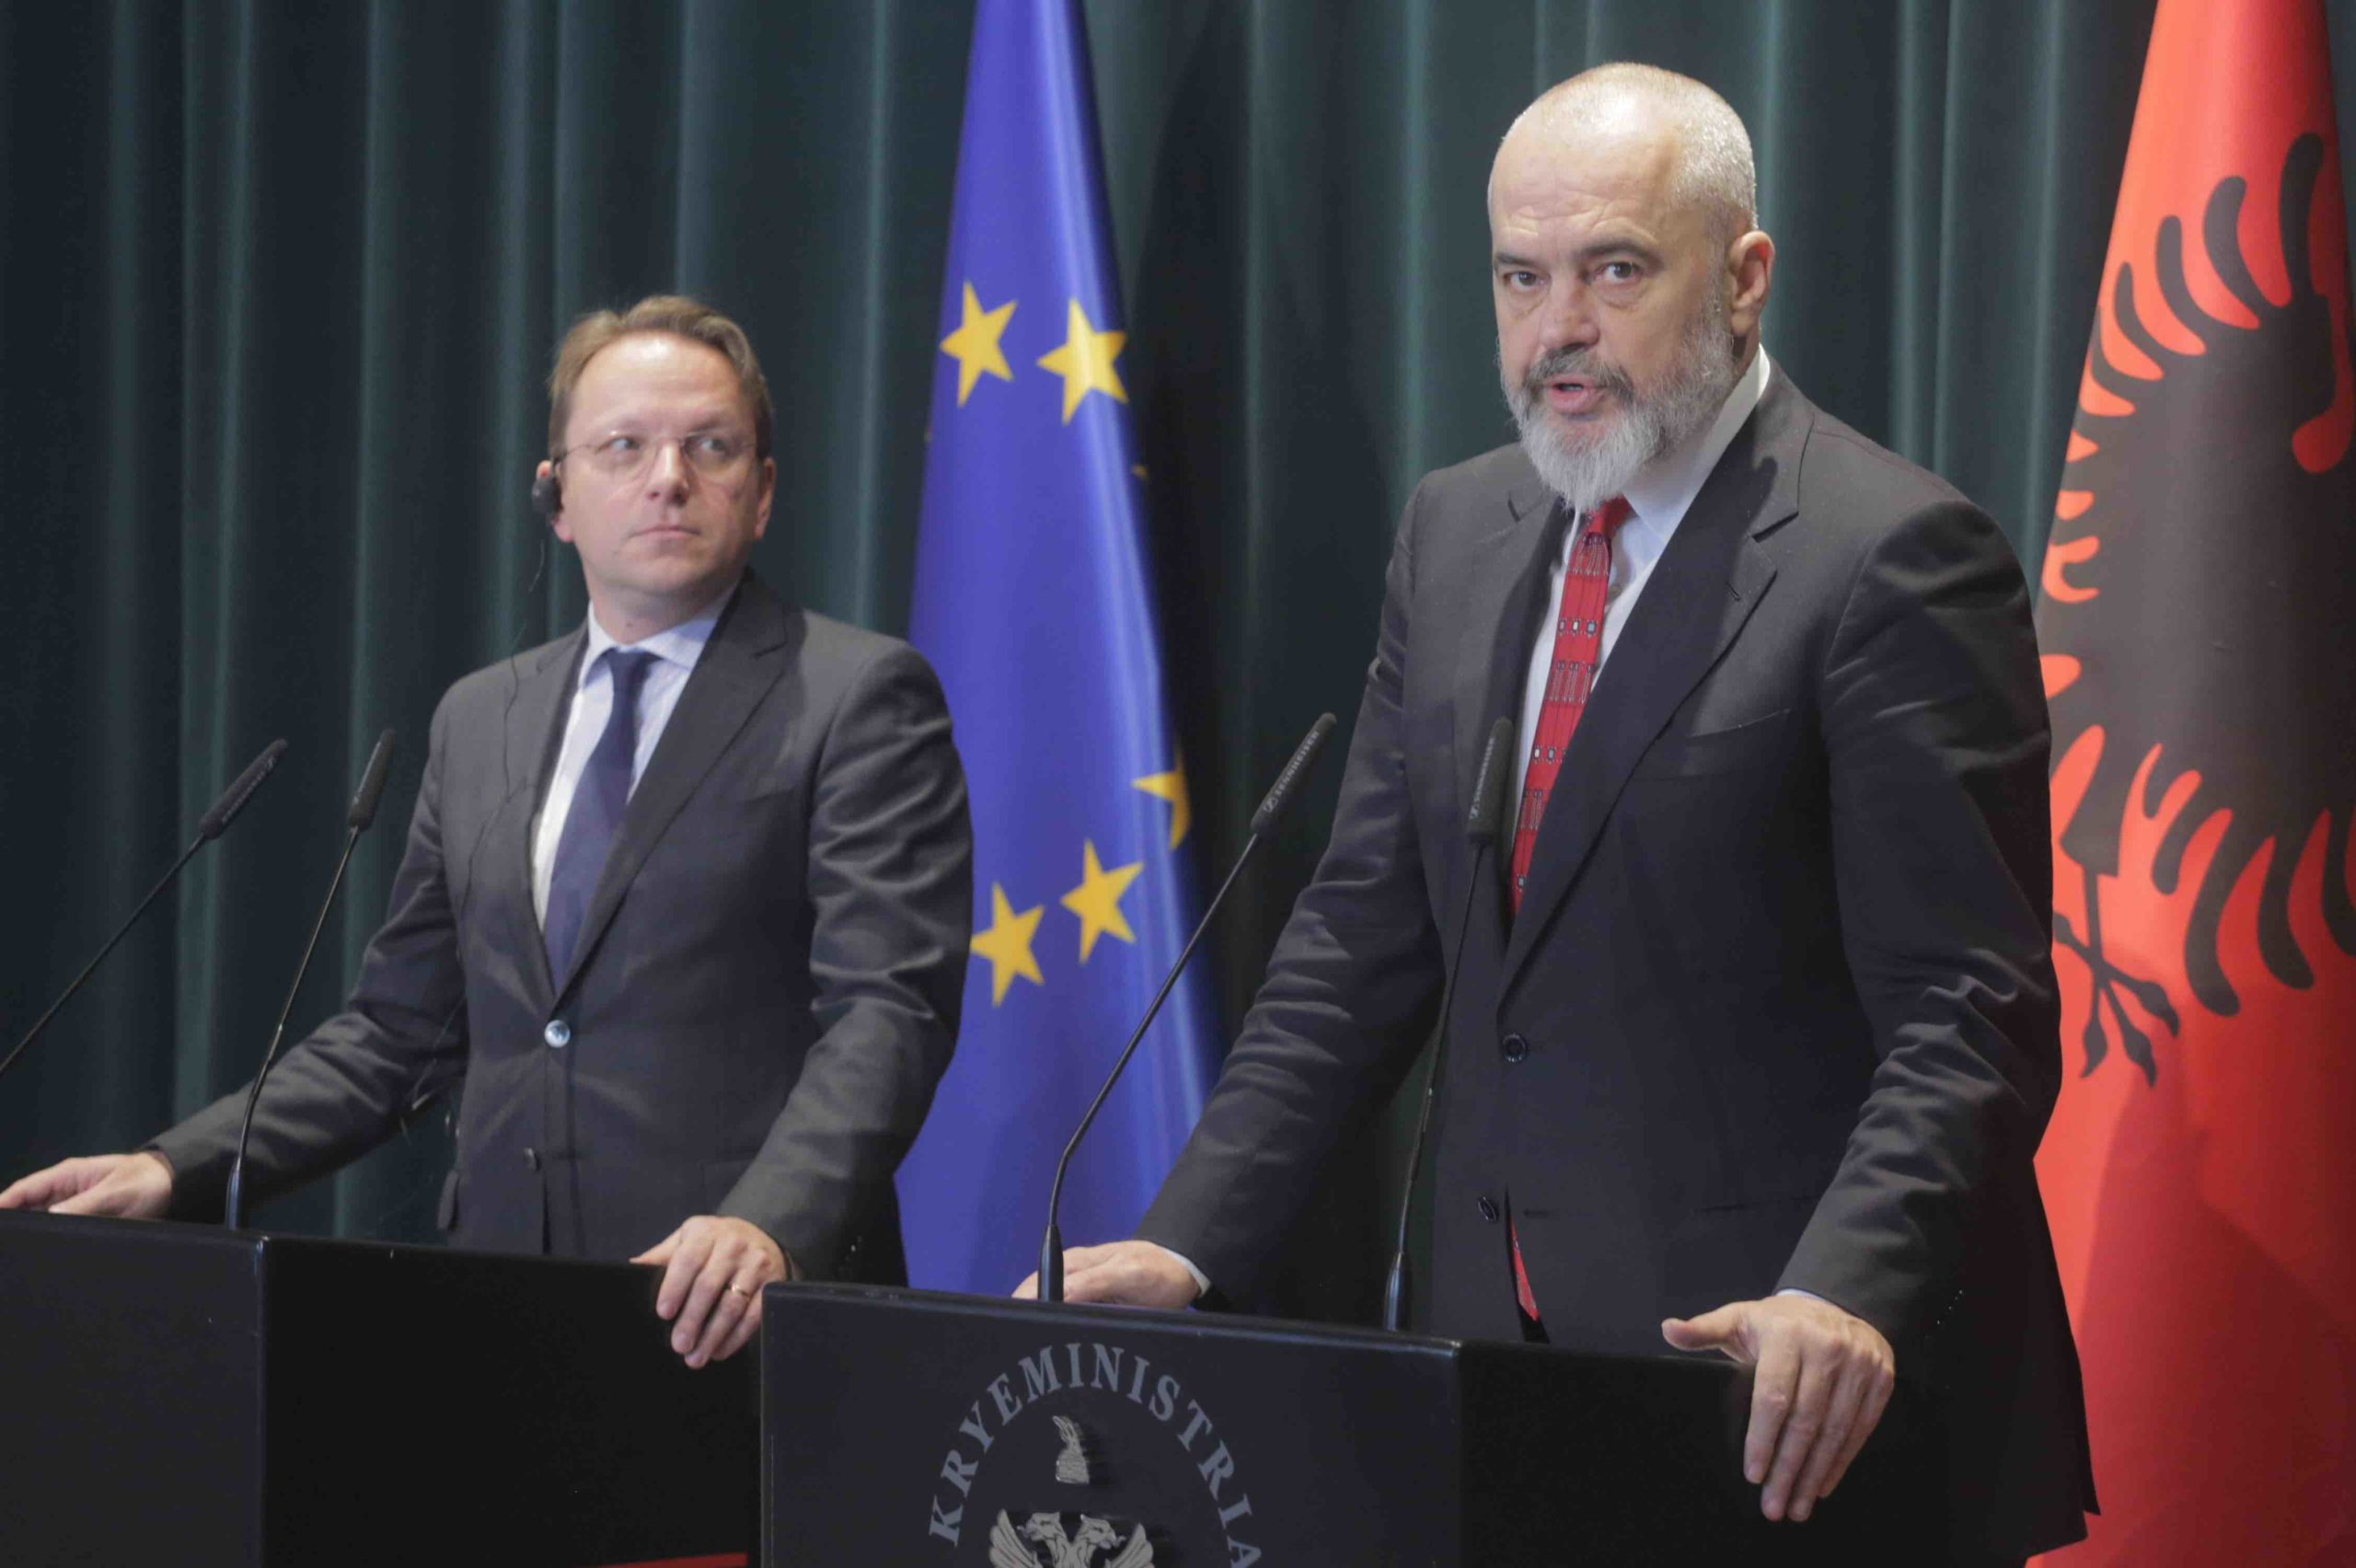 Rama and Varhelyi to chair Western Balkans Summit on June 10th in Tirana